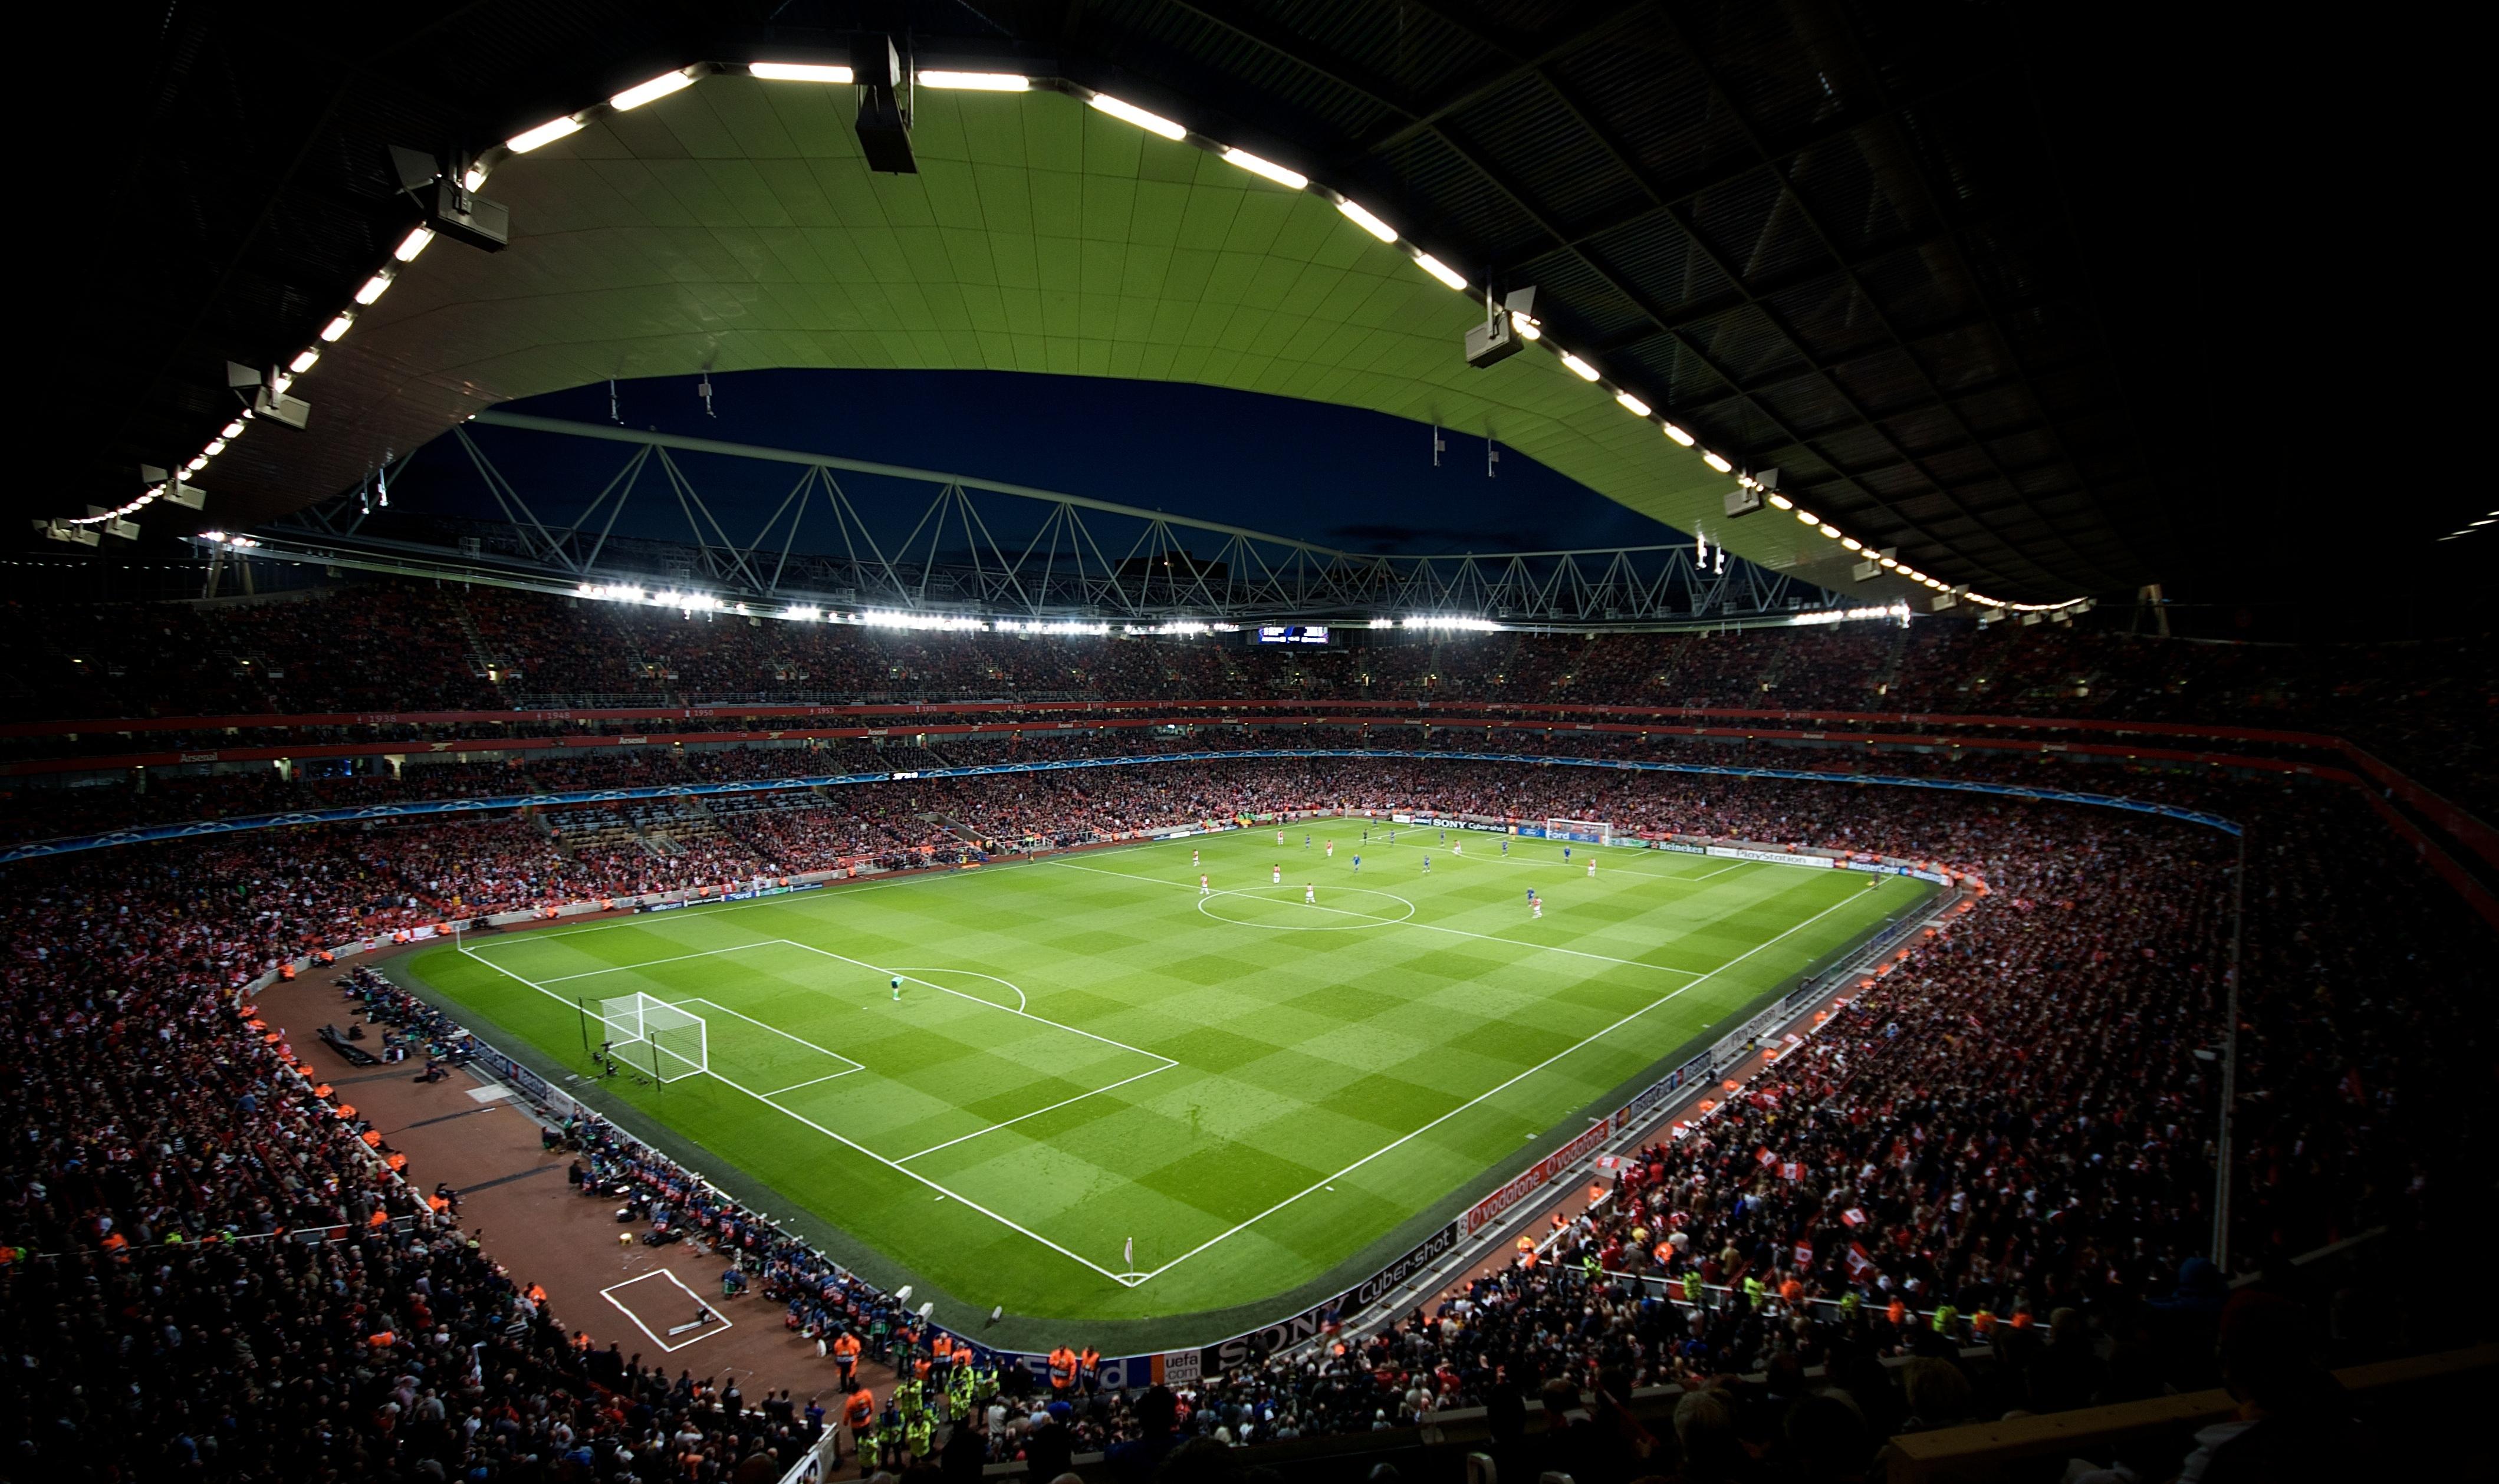 Champions League Wallpaper Champions League Emirates Stadium 4238x2517